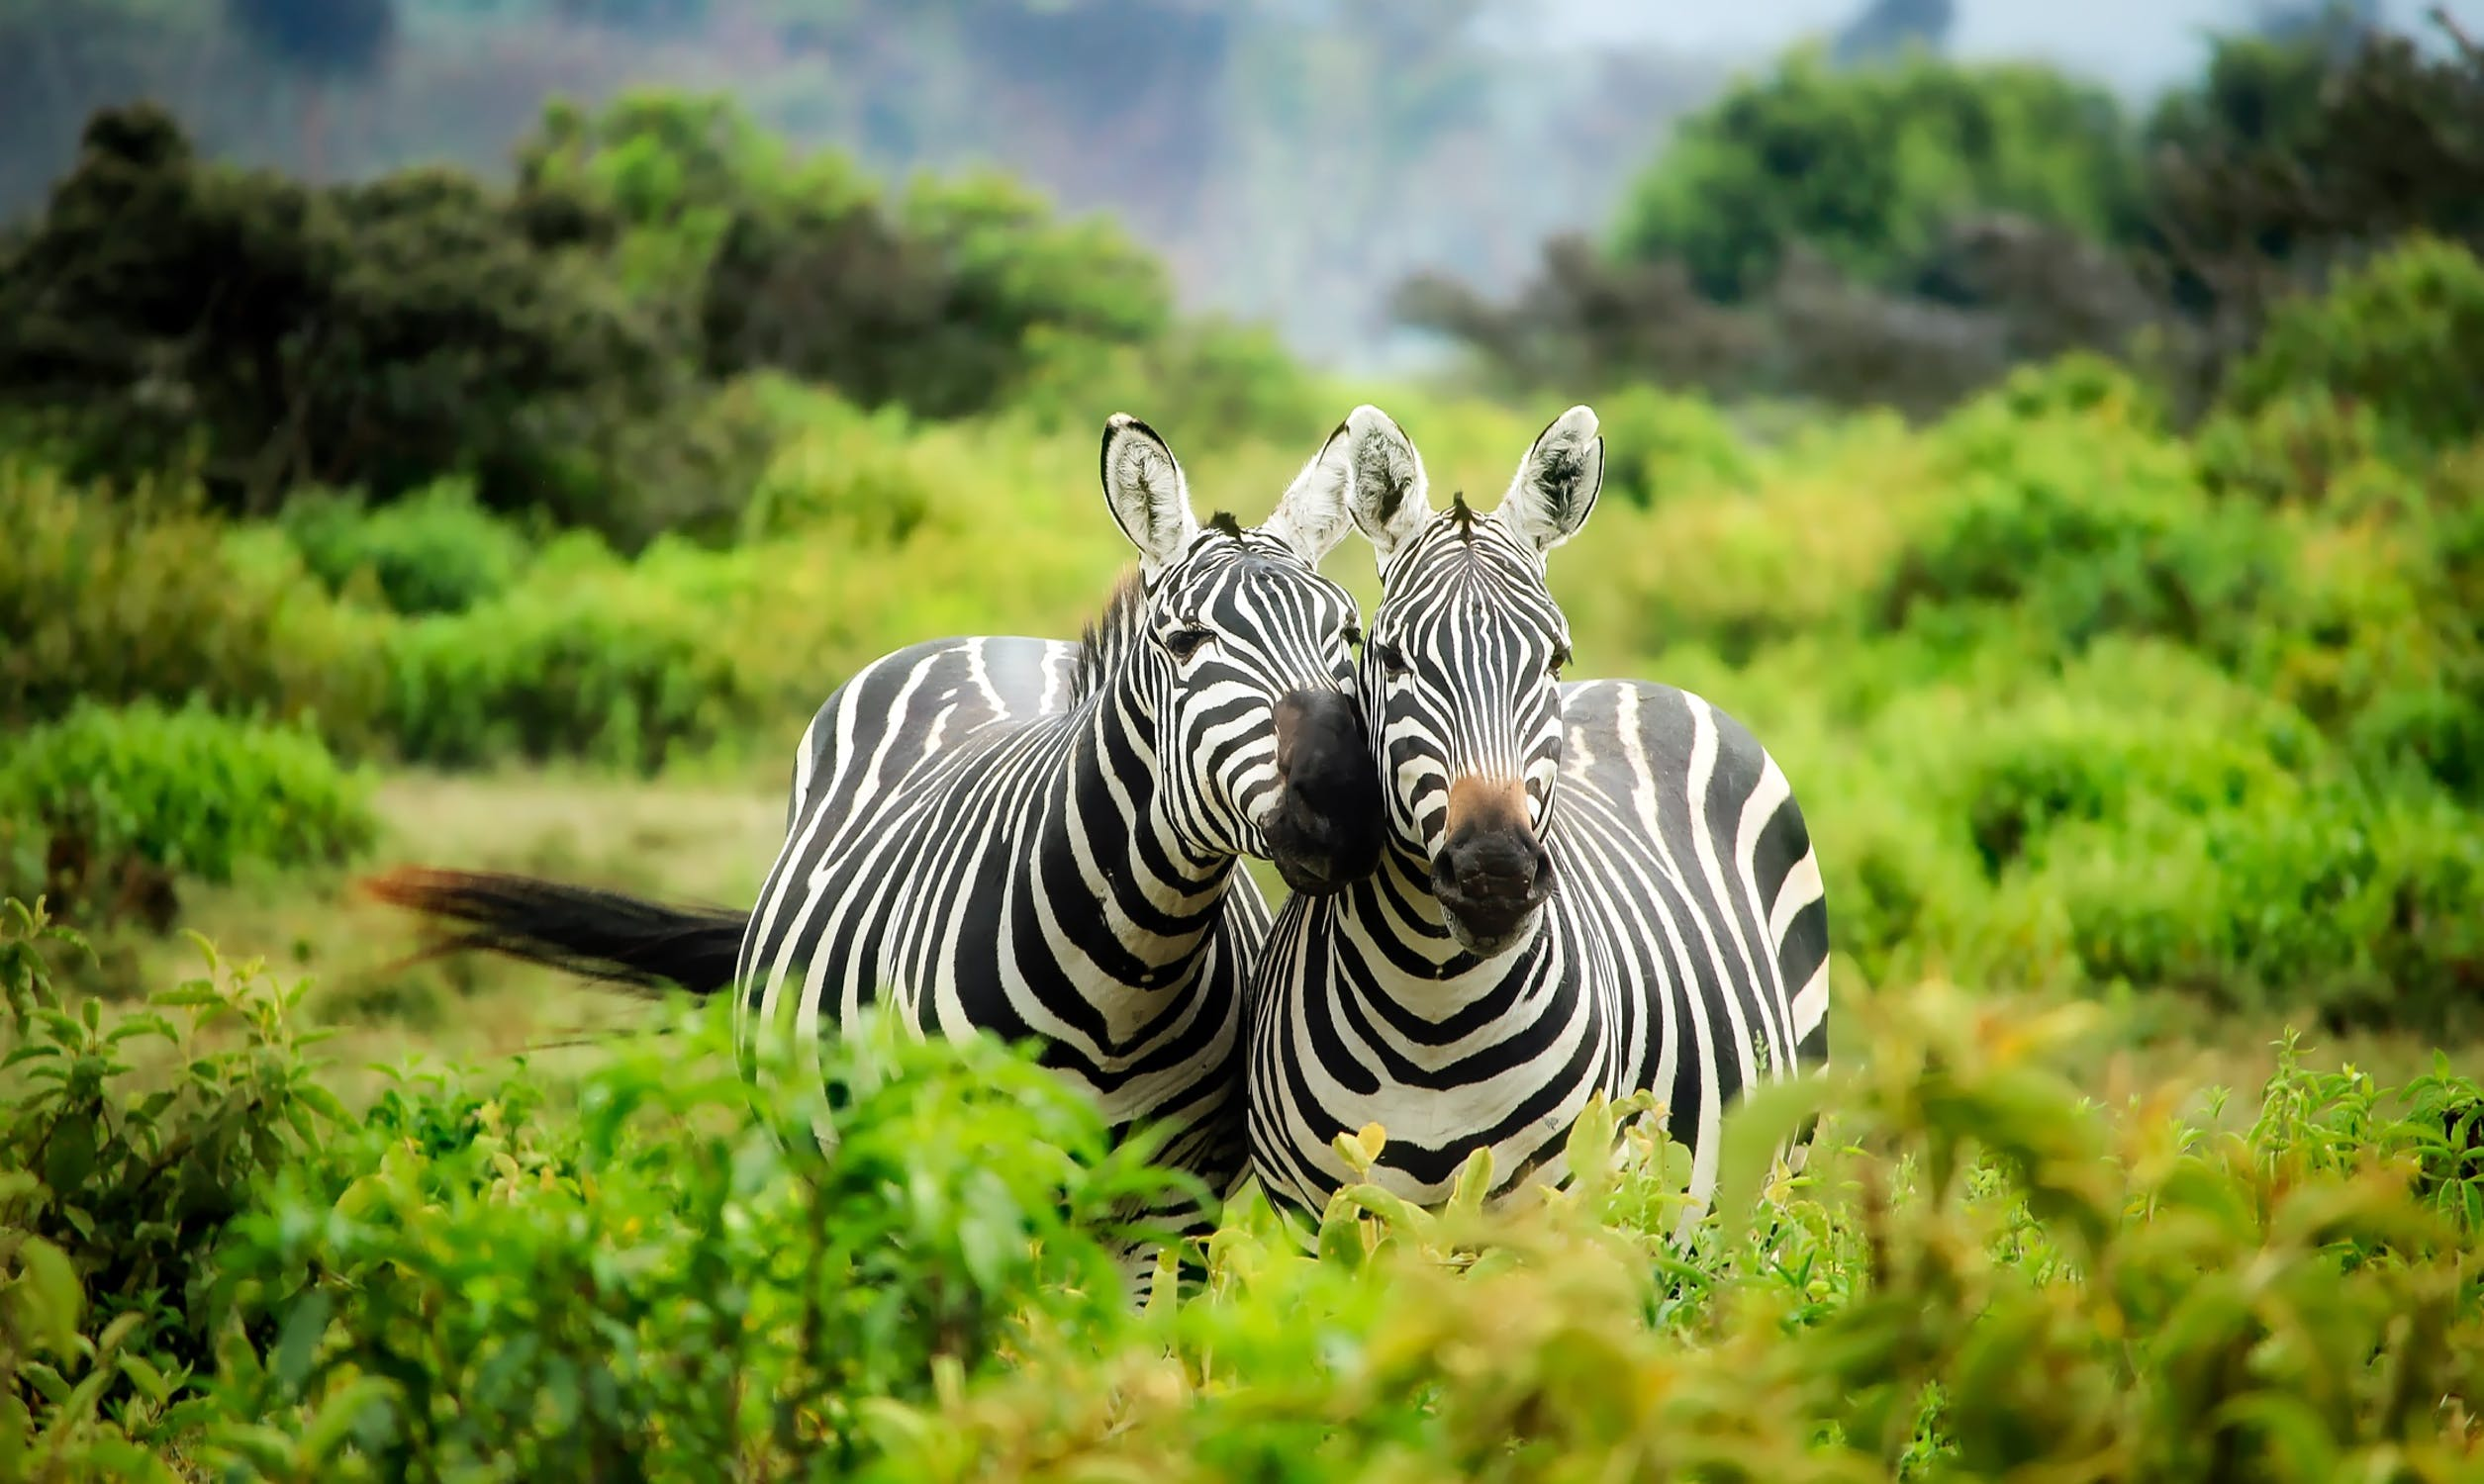 zebras, Travel Africa, Africa Safari Guide, Luxury African Safari